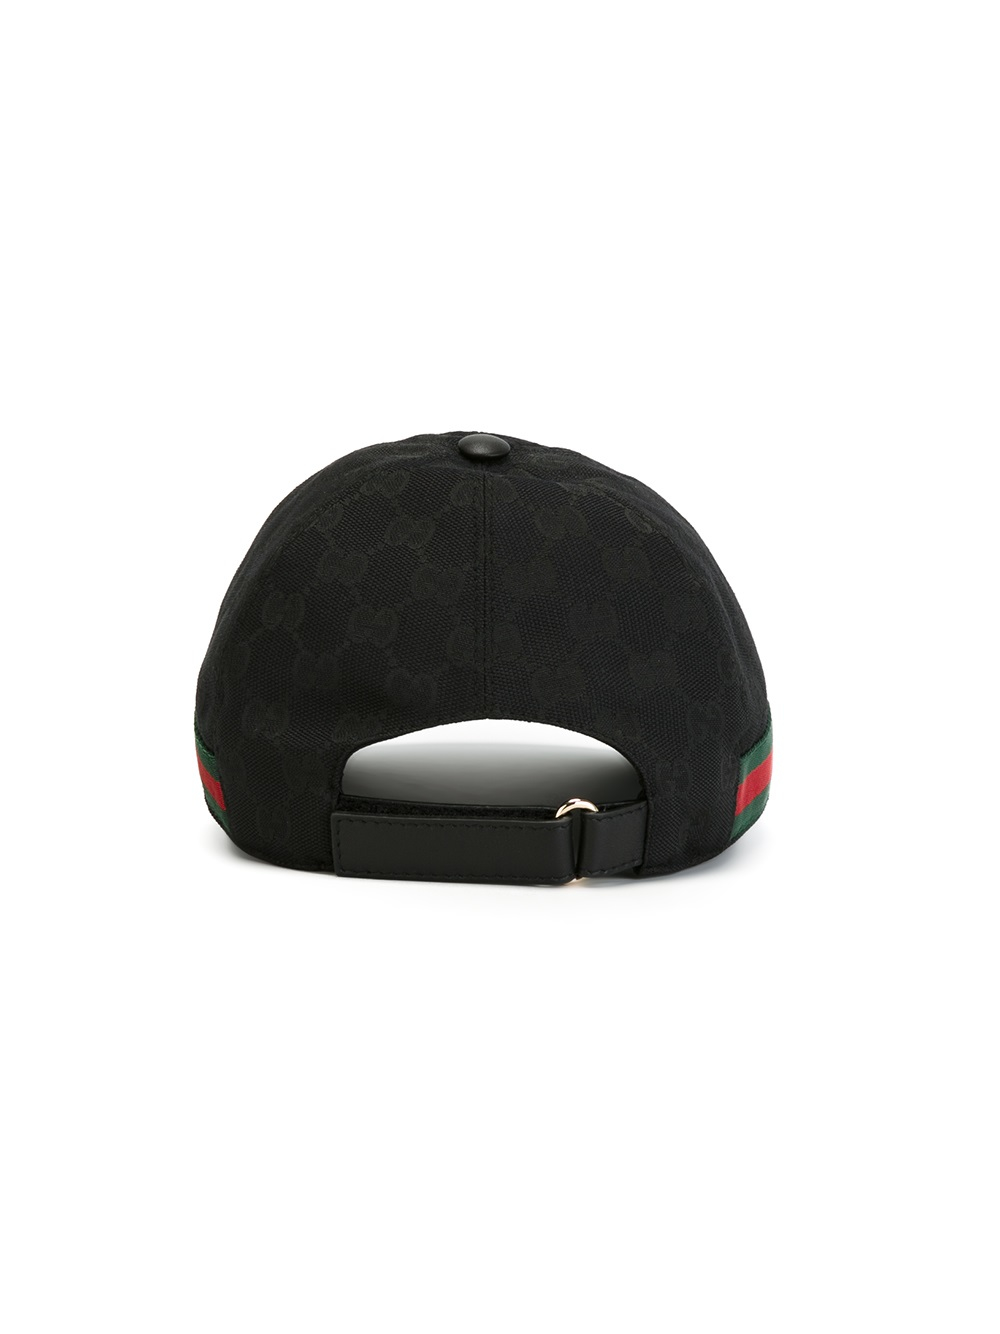 740a0b3f5 Gucci Original Gg Canvas Baseball Hat for Men - Lyst